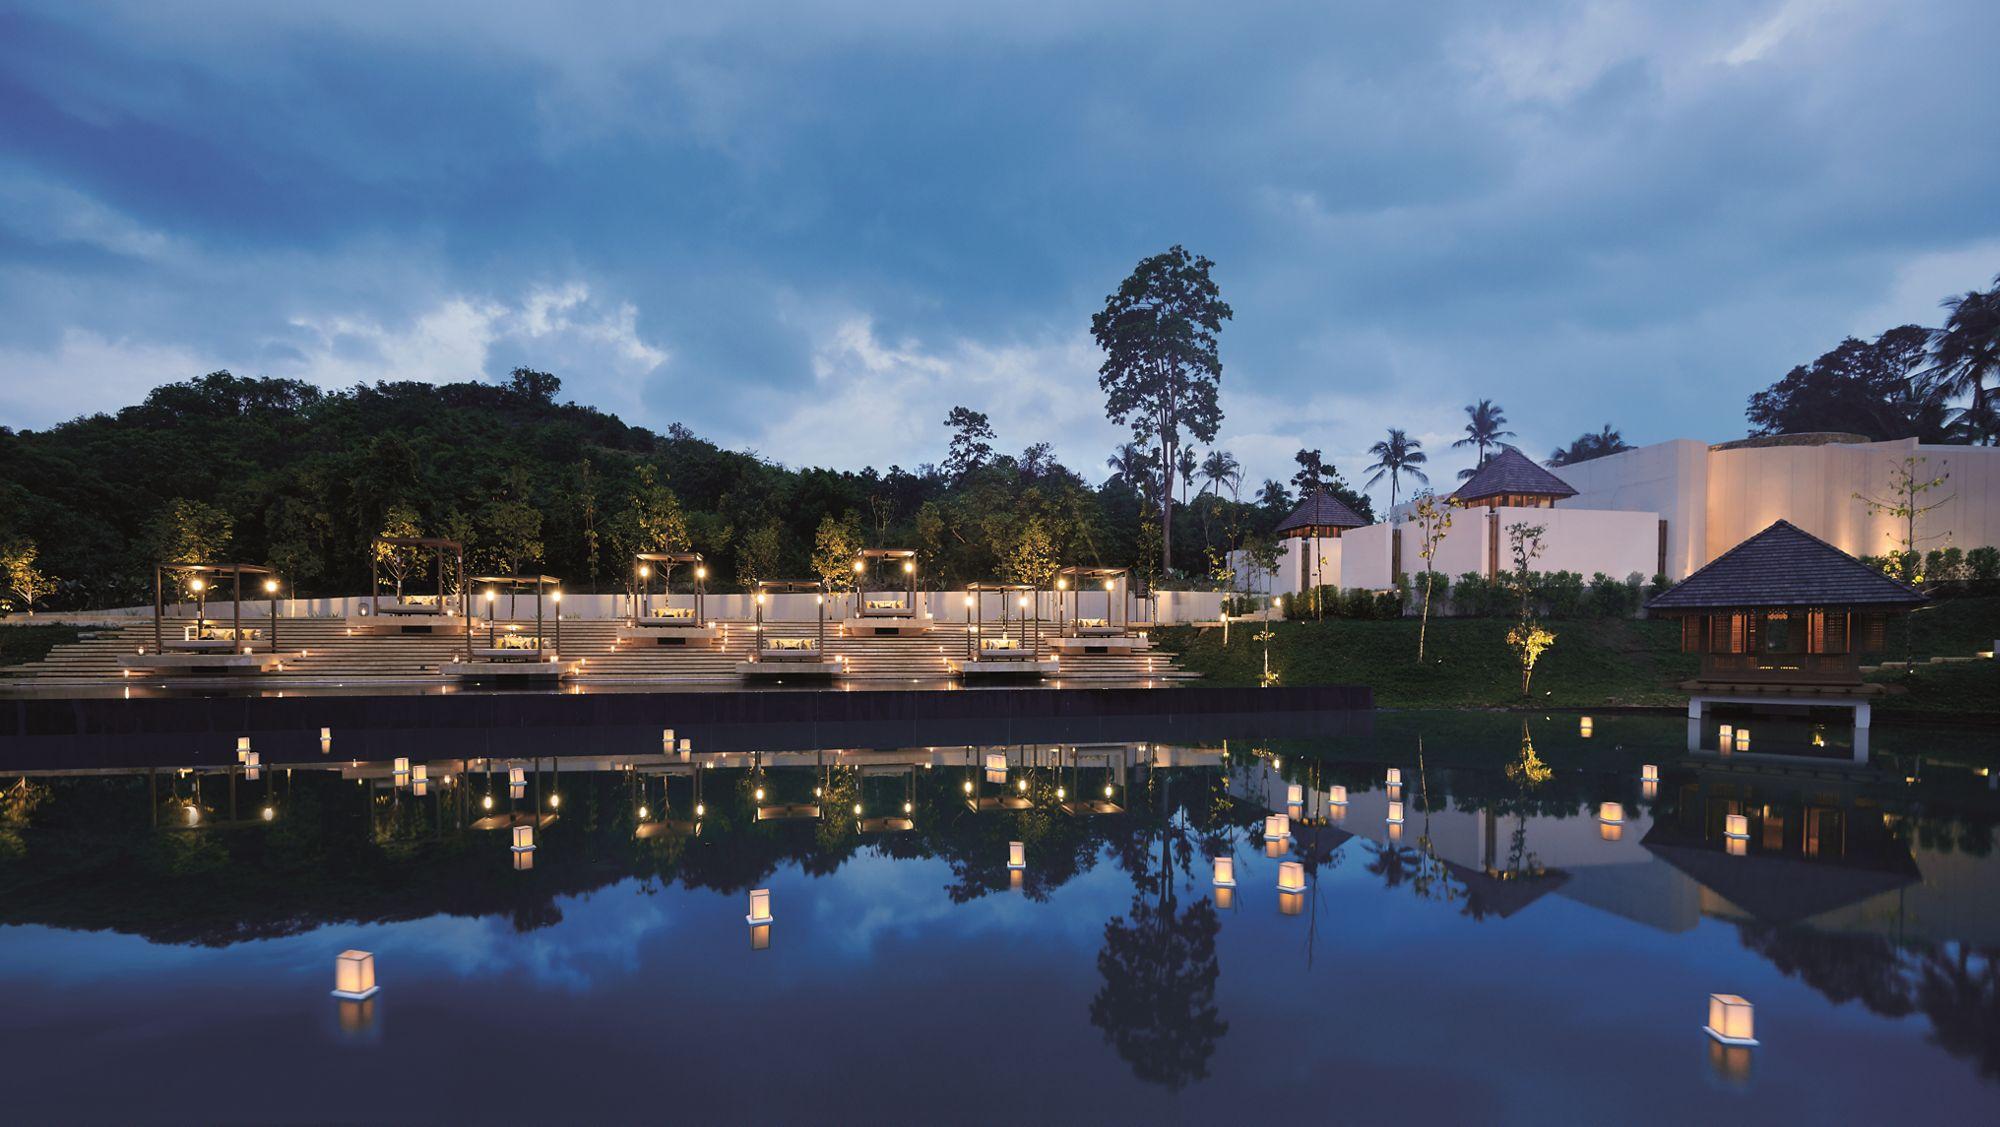 The Ritz Carlton, Koh Samui - Top 10 Best Luxury Hotels And Resorts in Koh Samui